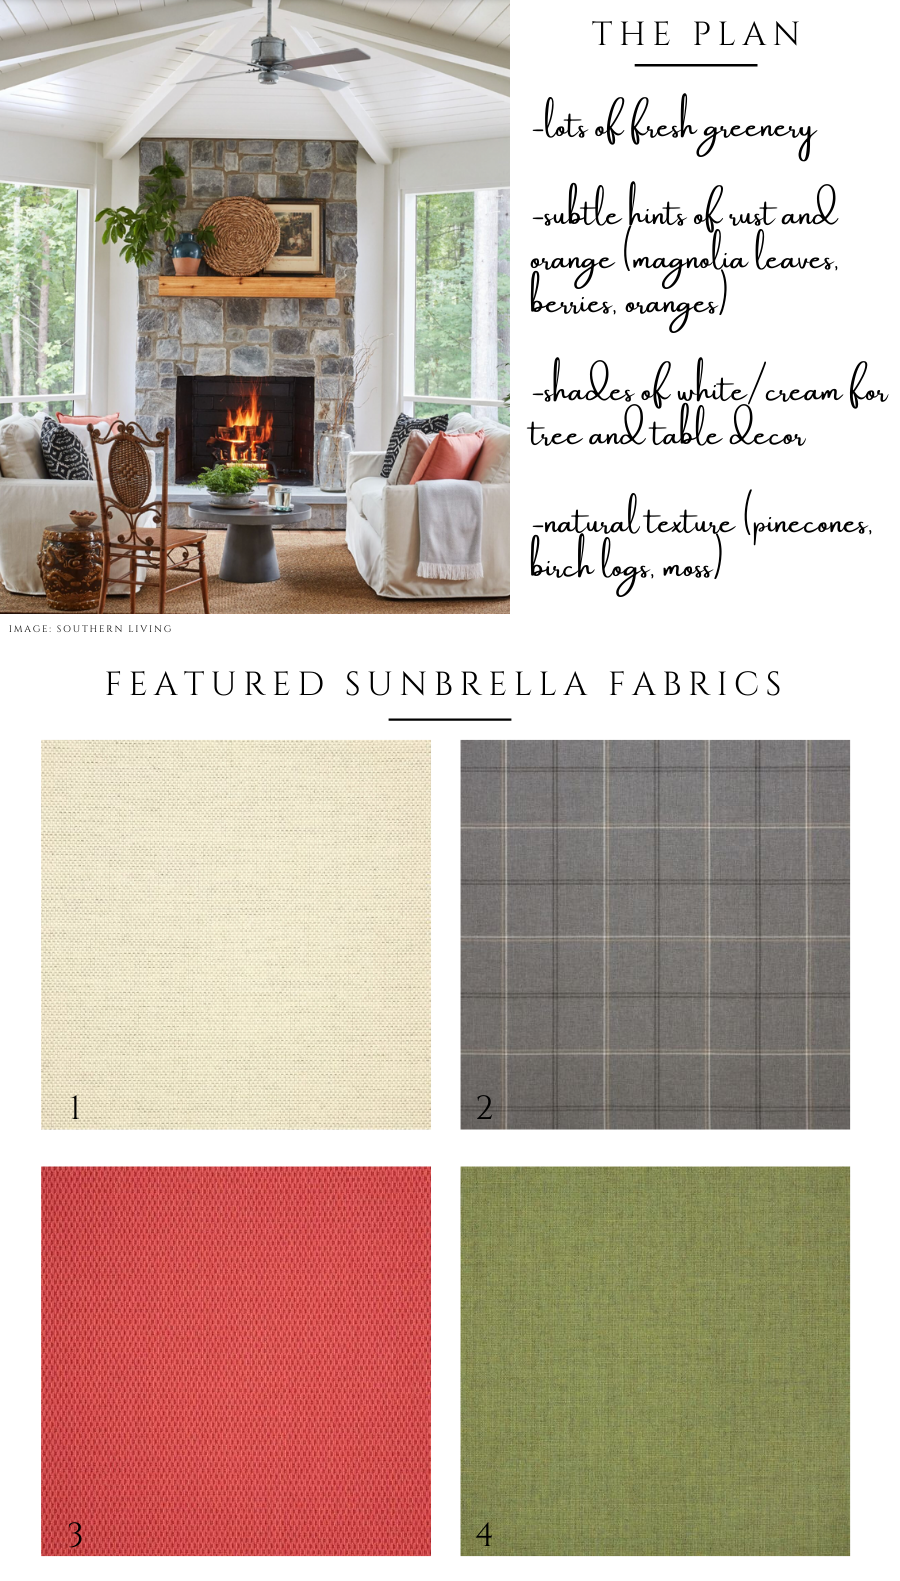 Sunbrella-Fabrics-Holiday-Styling-Plan